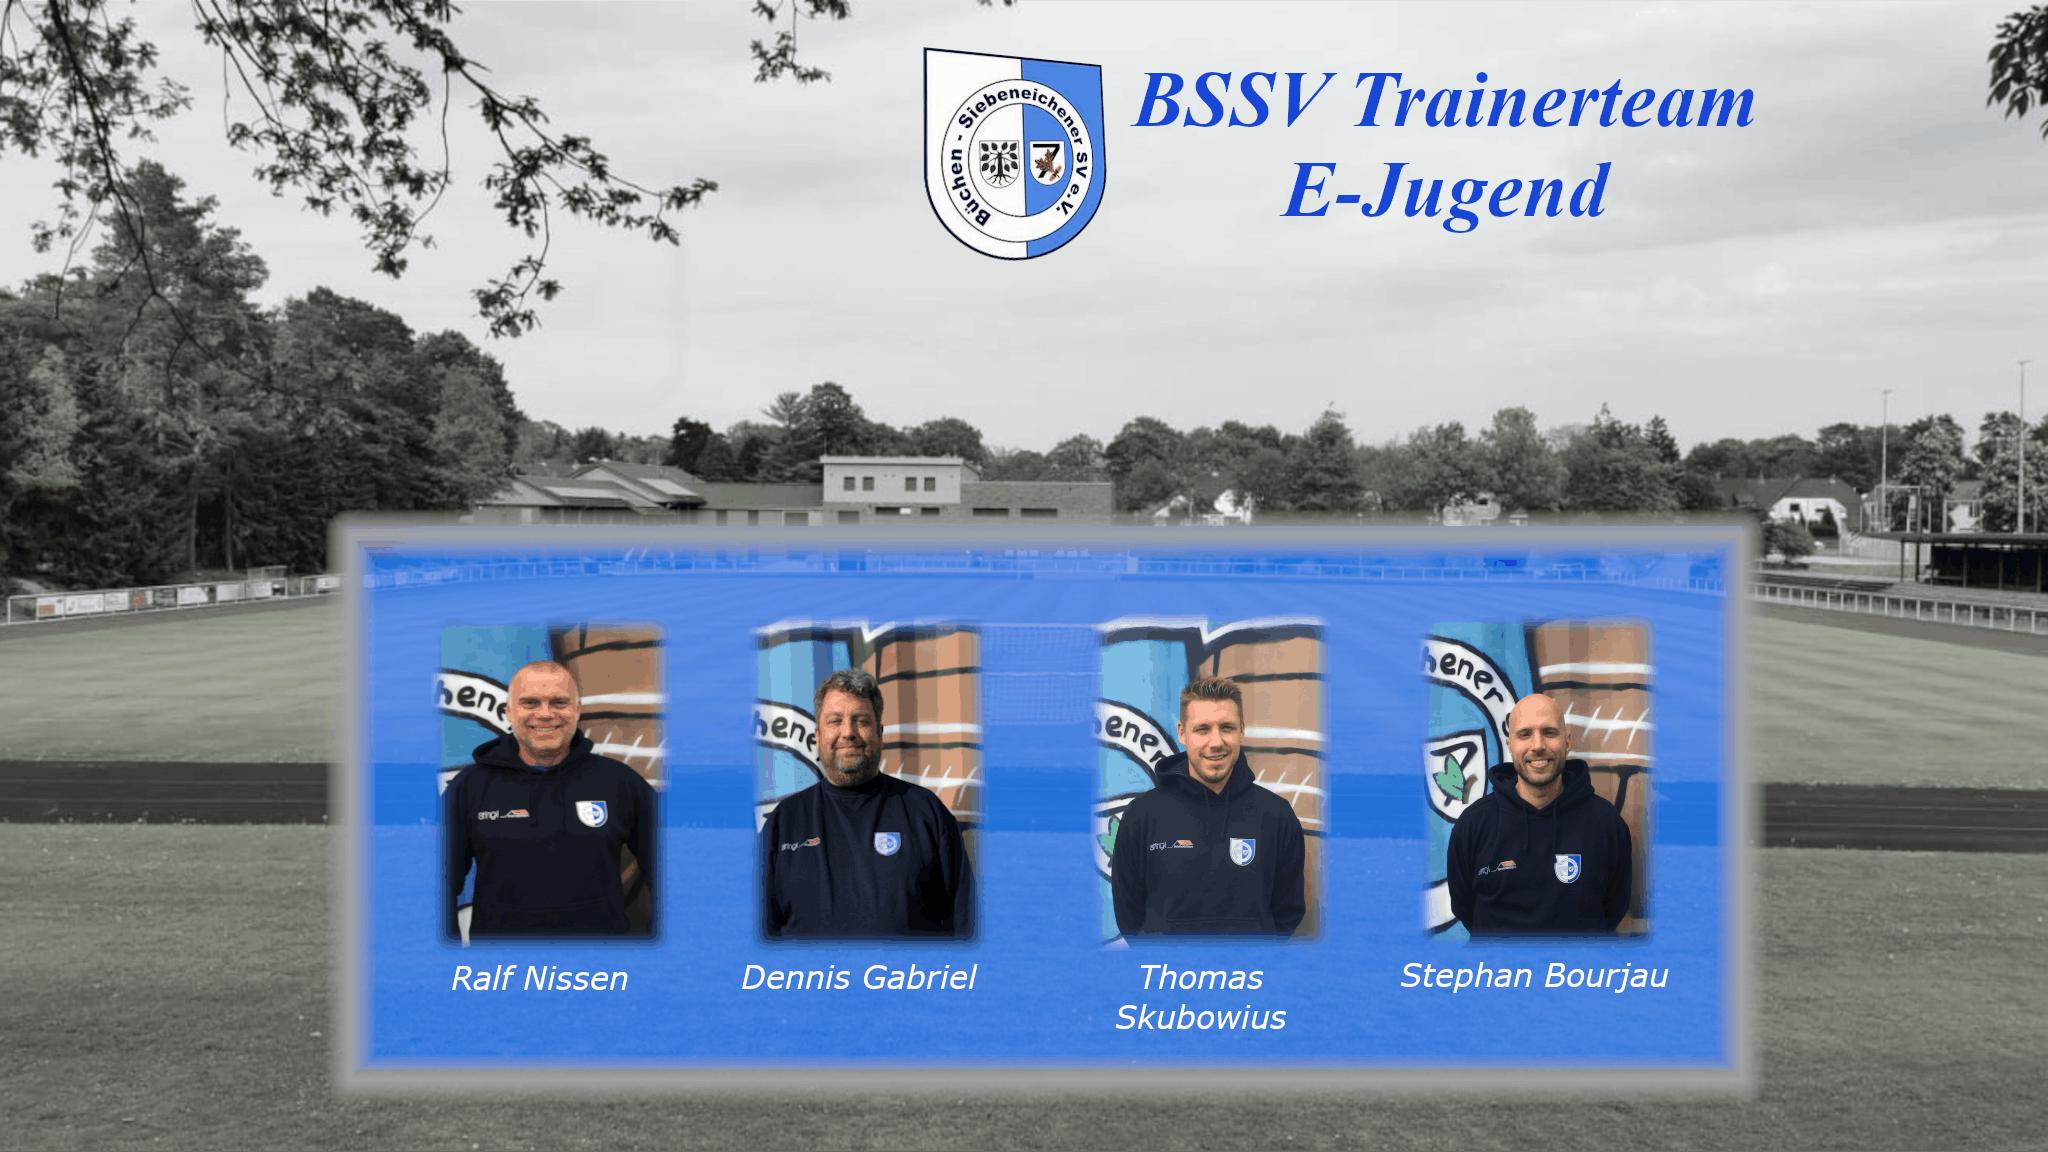 Das Trainerteam der E-Jugend